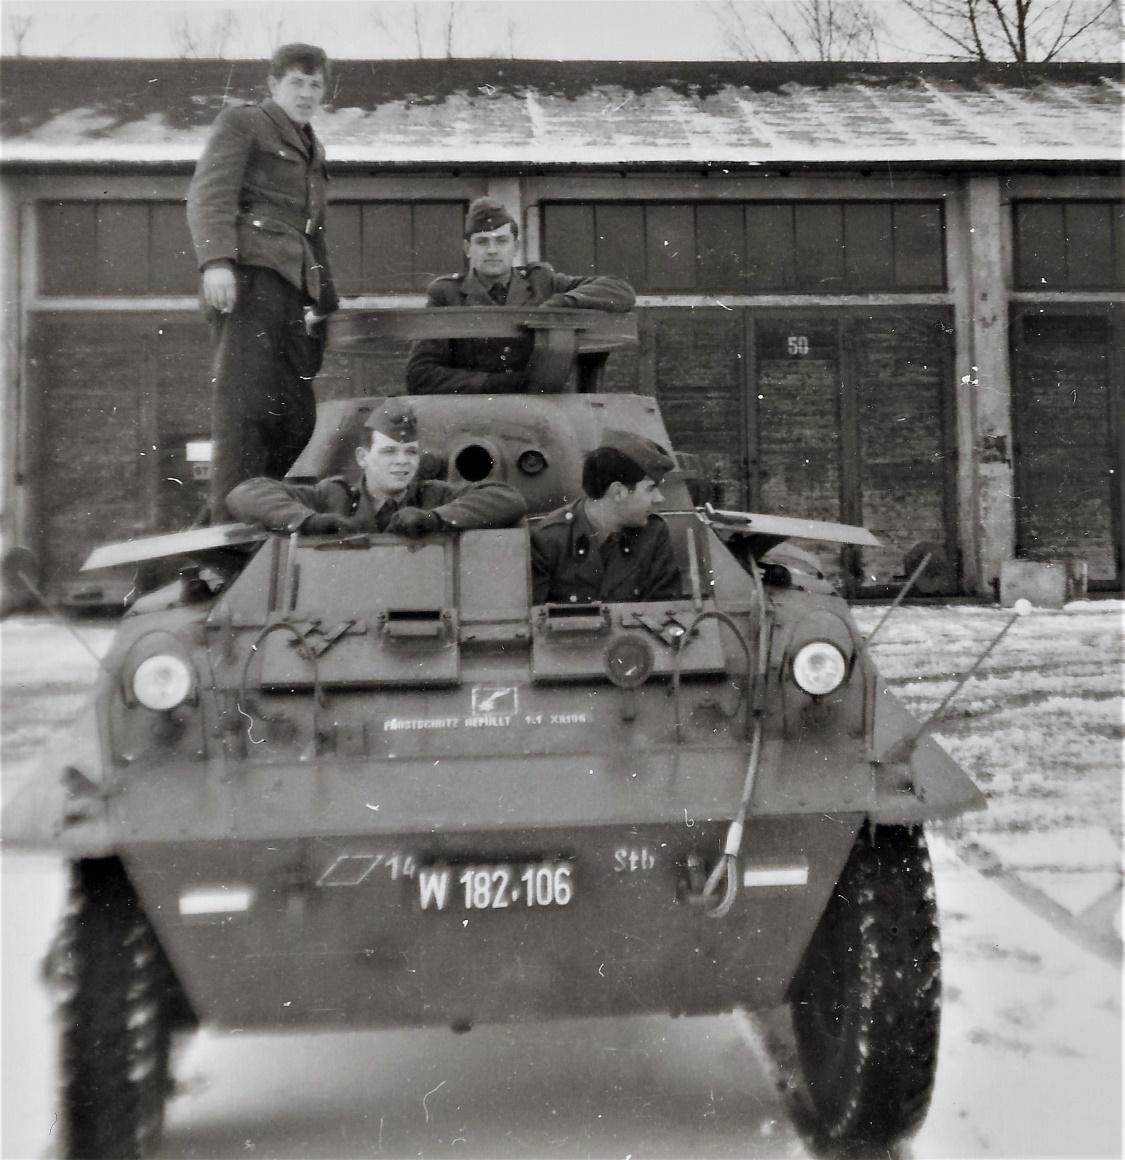 D:\Archiv Nemeth\Fzg-Gerät-Ausrüstung\Fahrzeuge\Mehrspurige Kfz\BH Fahrzeuge\M8\W 182 106 Fahrschule, 1965 4 (2).jpg